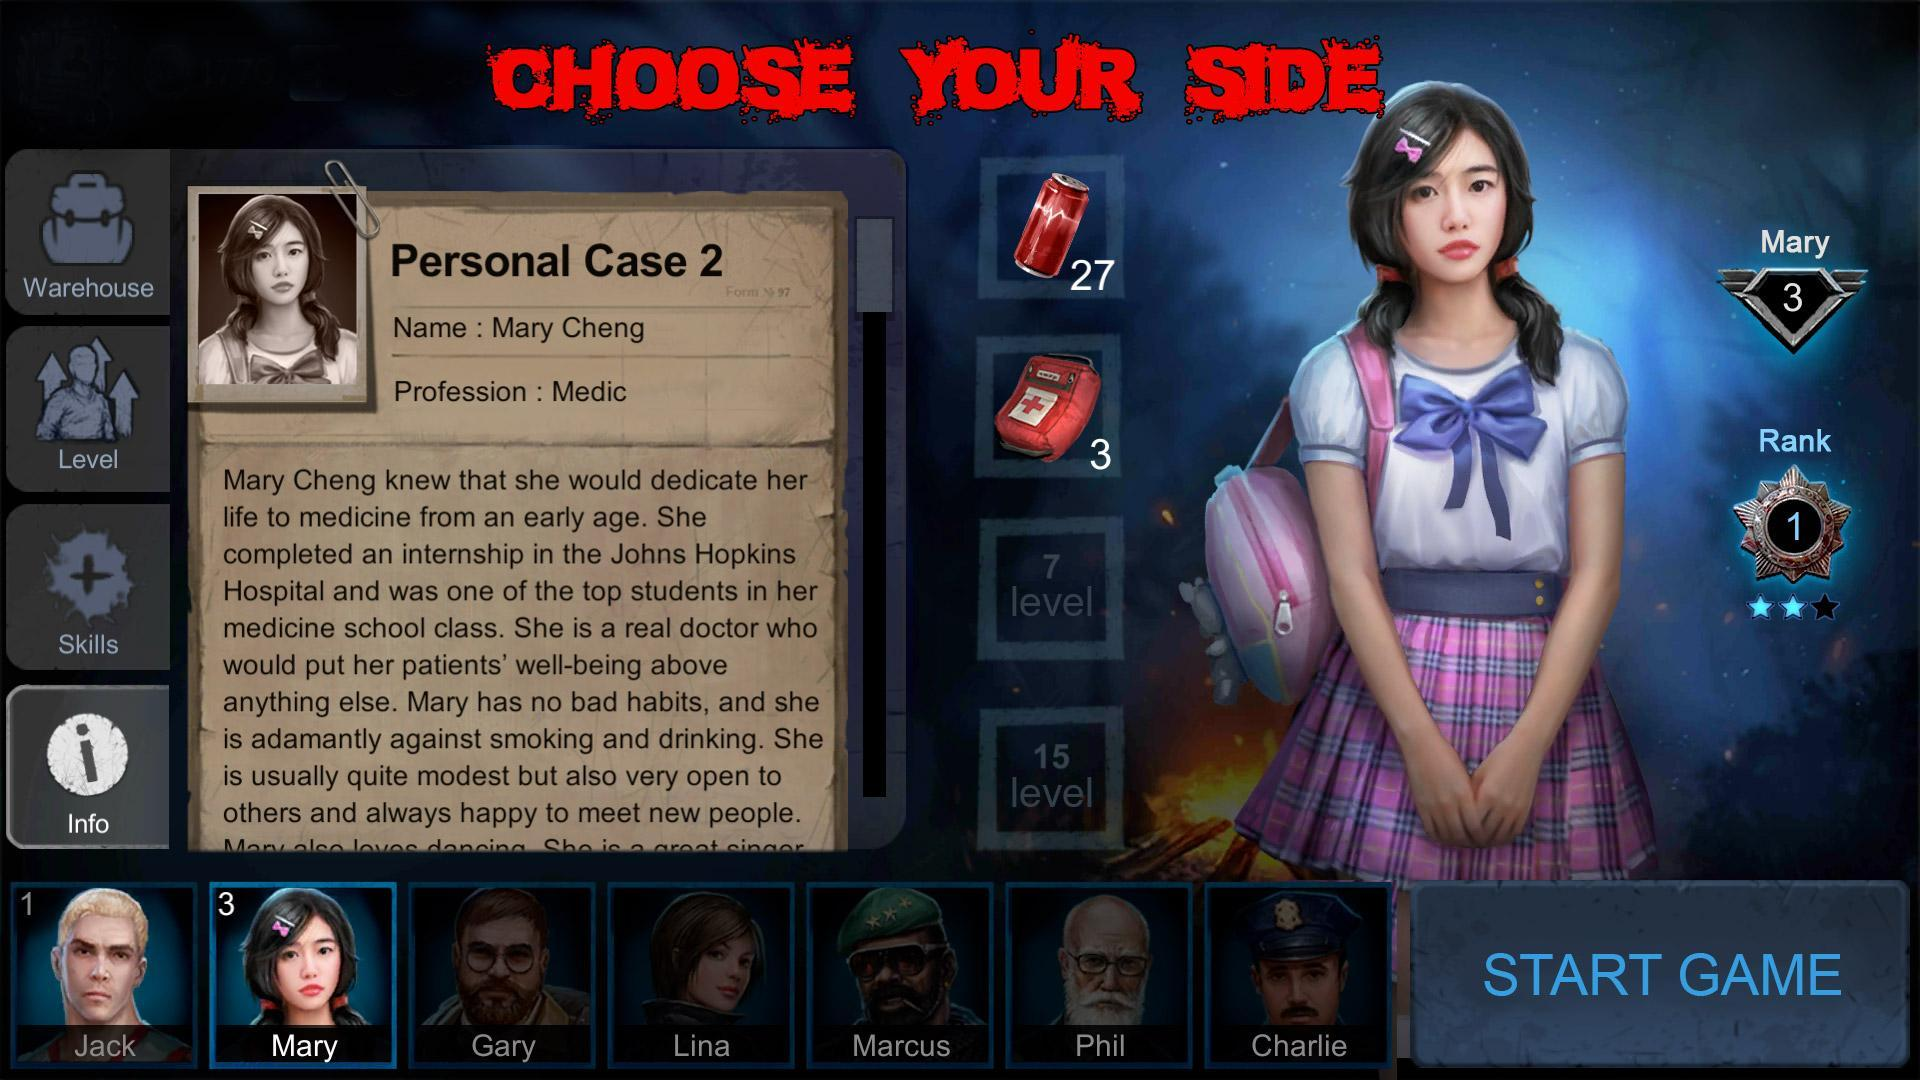 Horrorfield Multiplayer Survival Horror Game 1.3.6 Screenshot 19